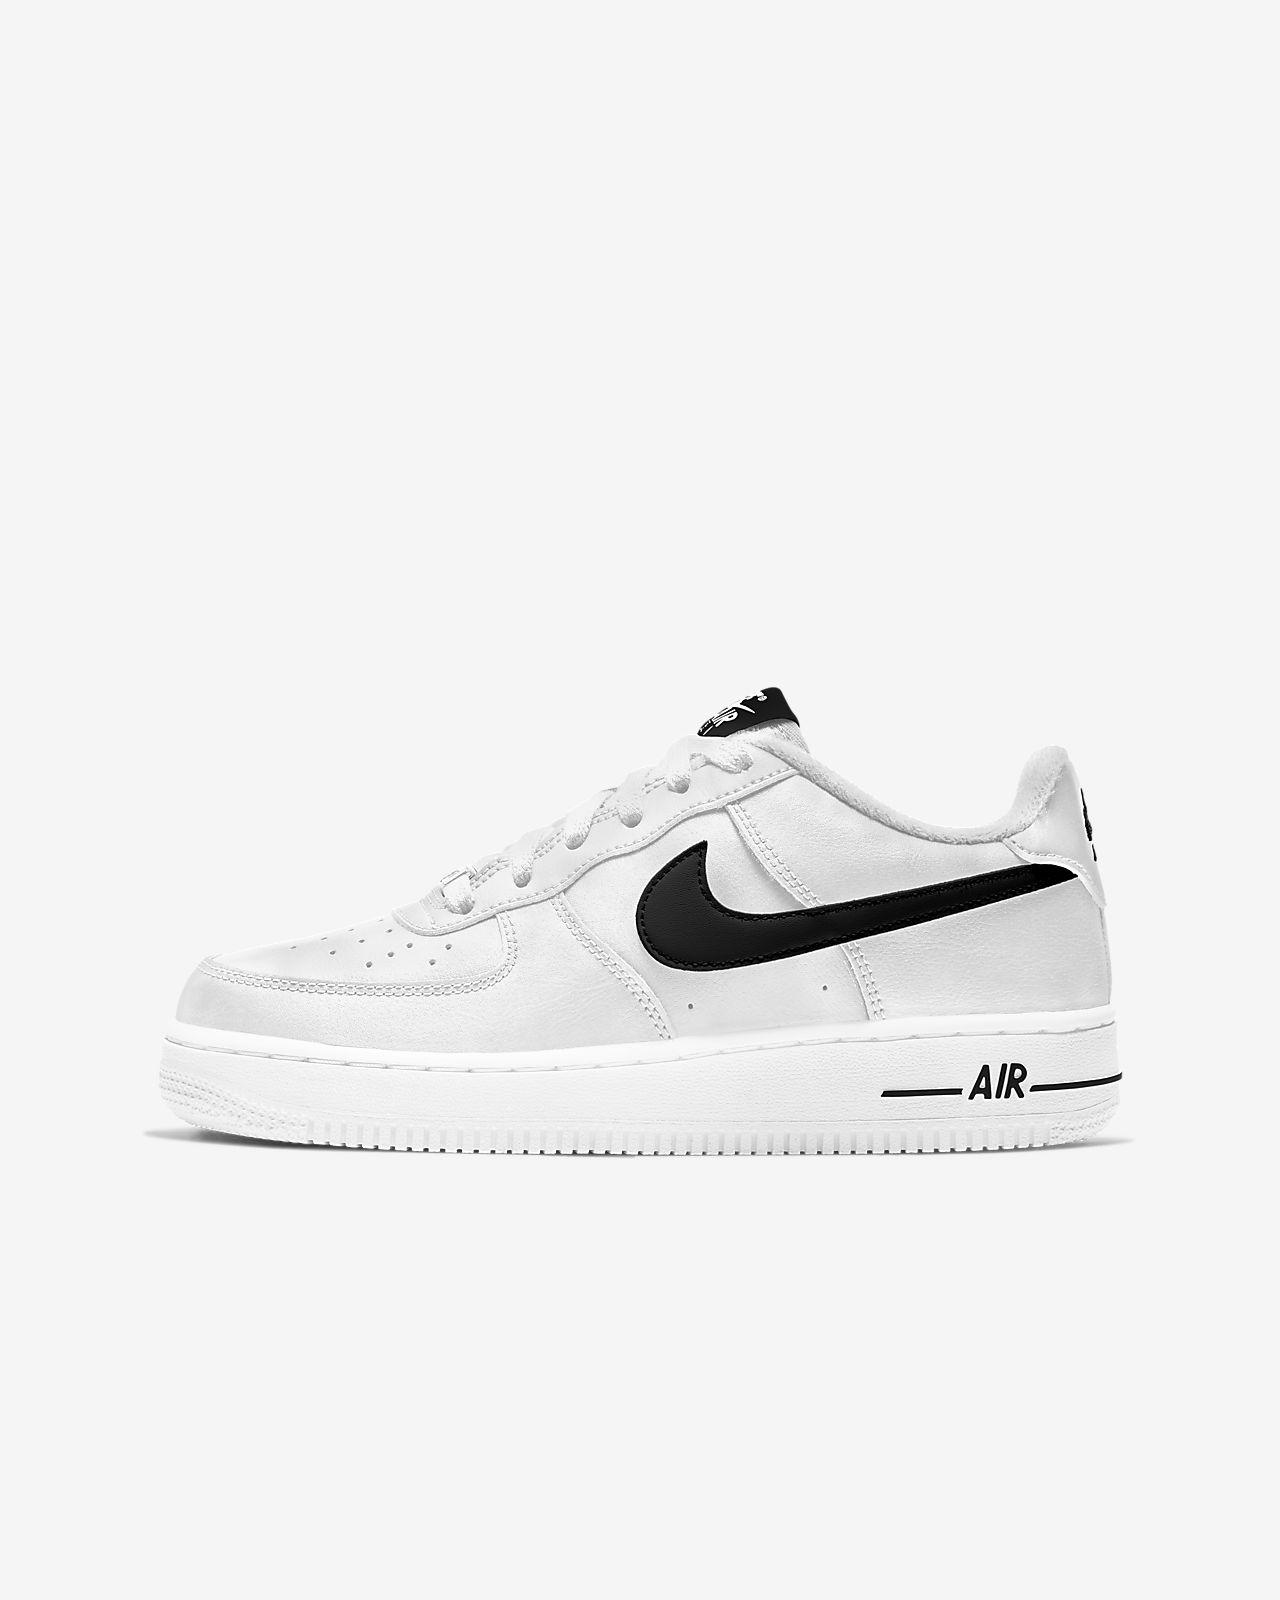 Nike Air Force 1 Kinderschoen